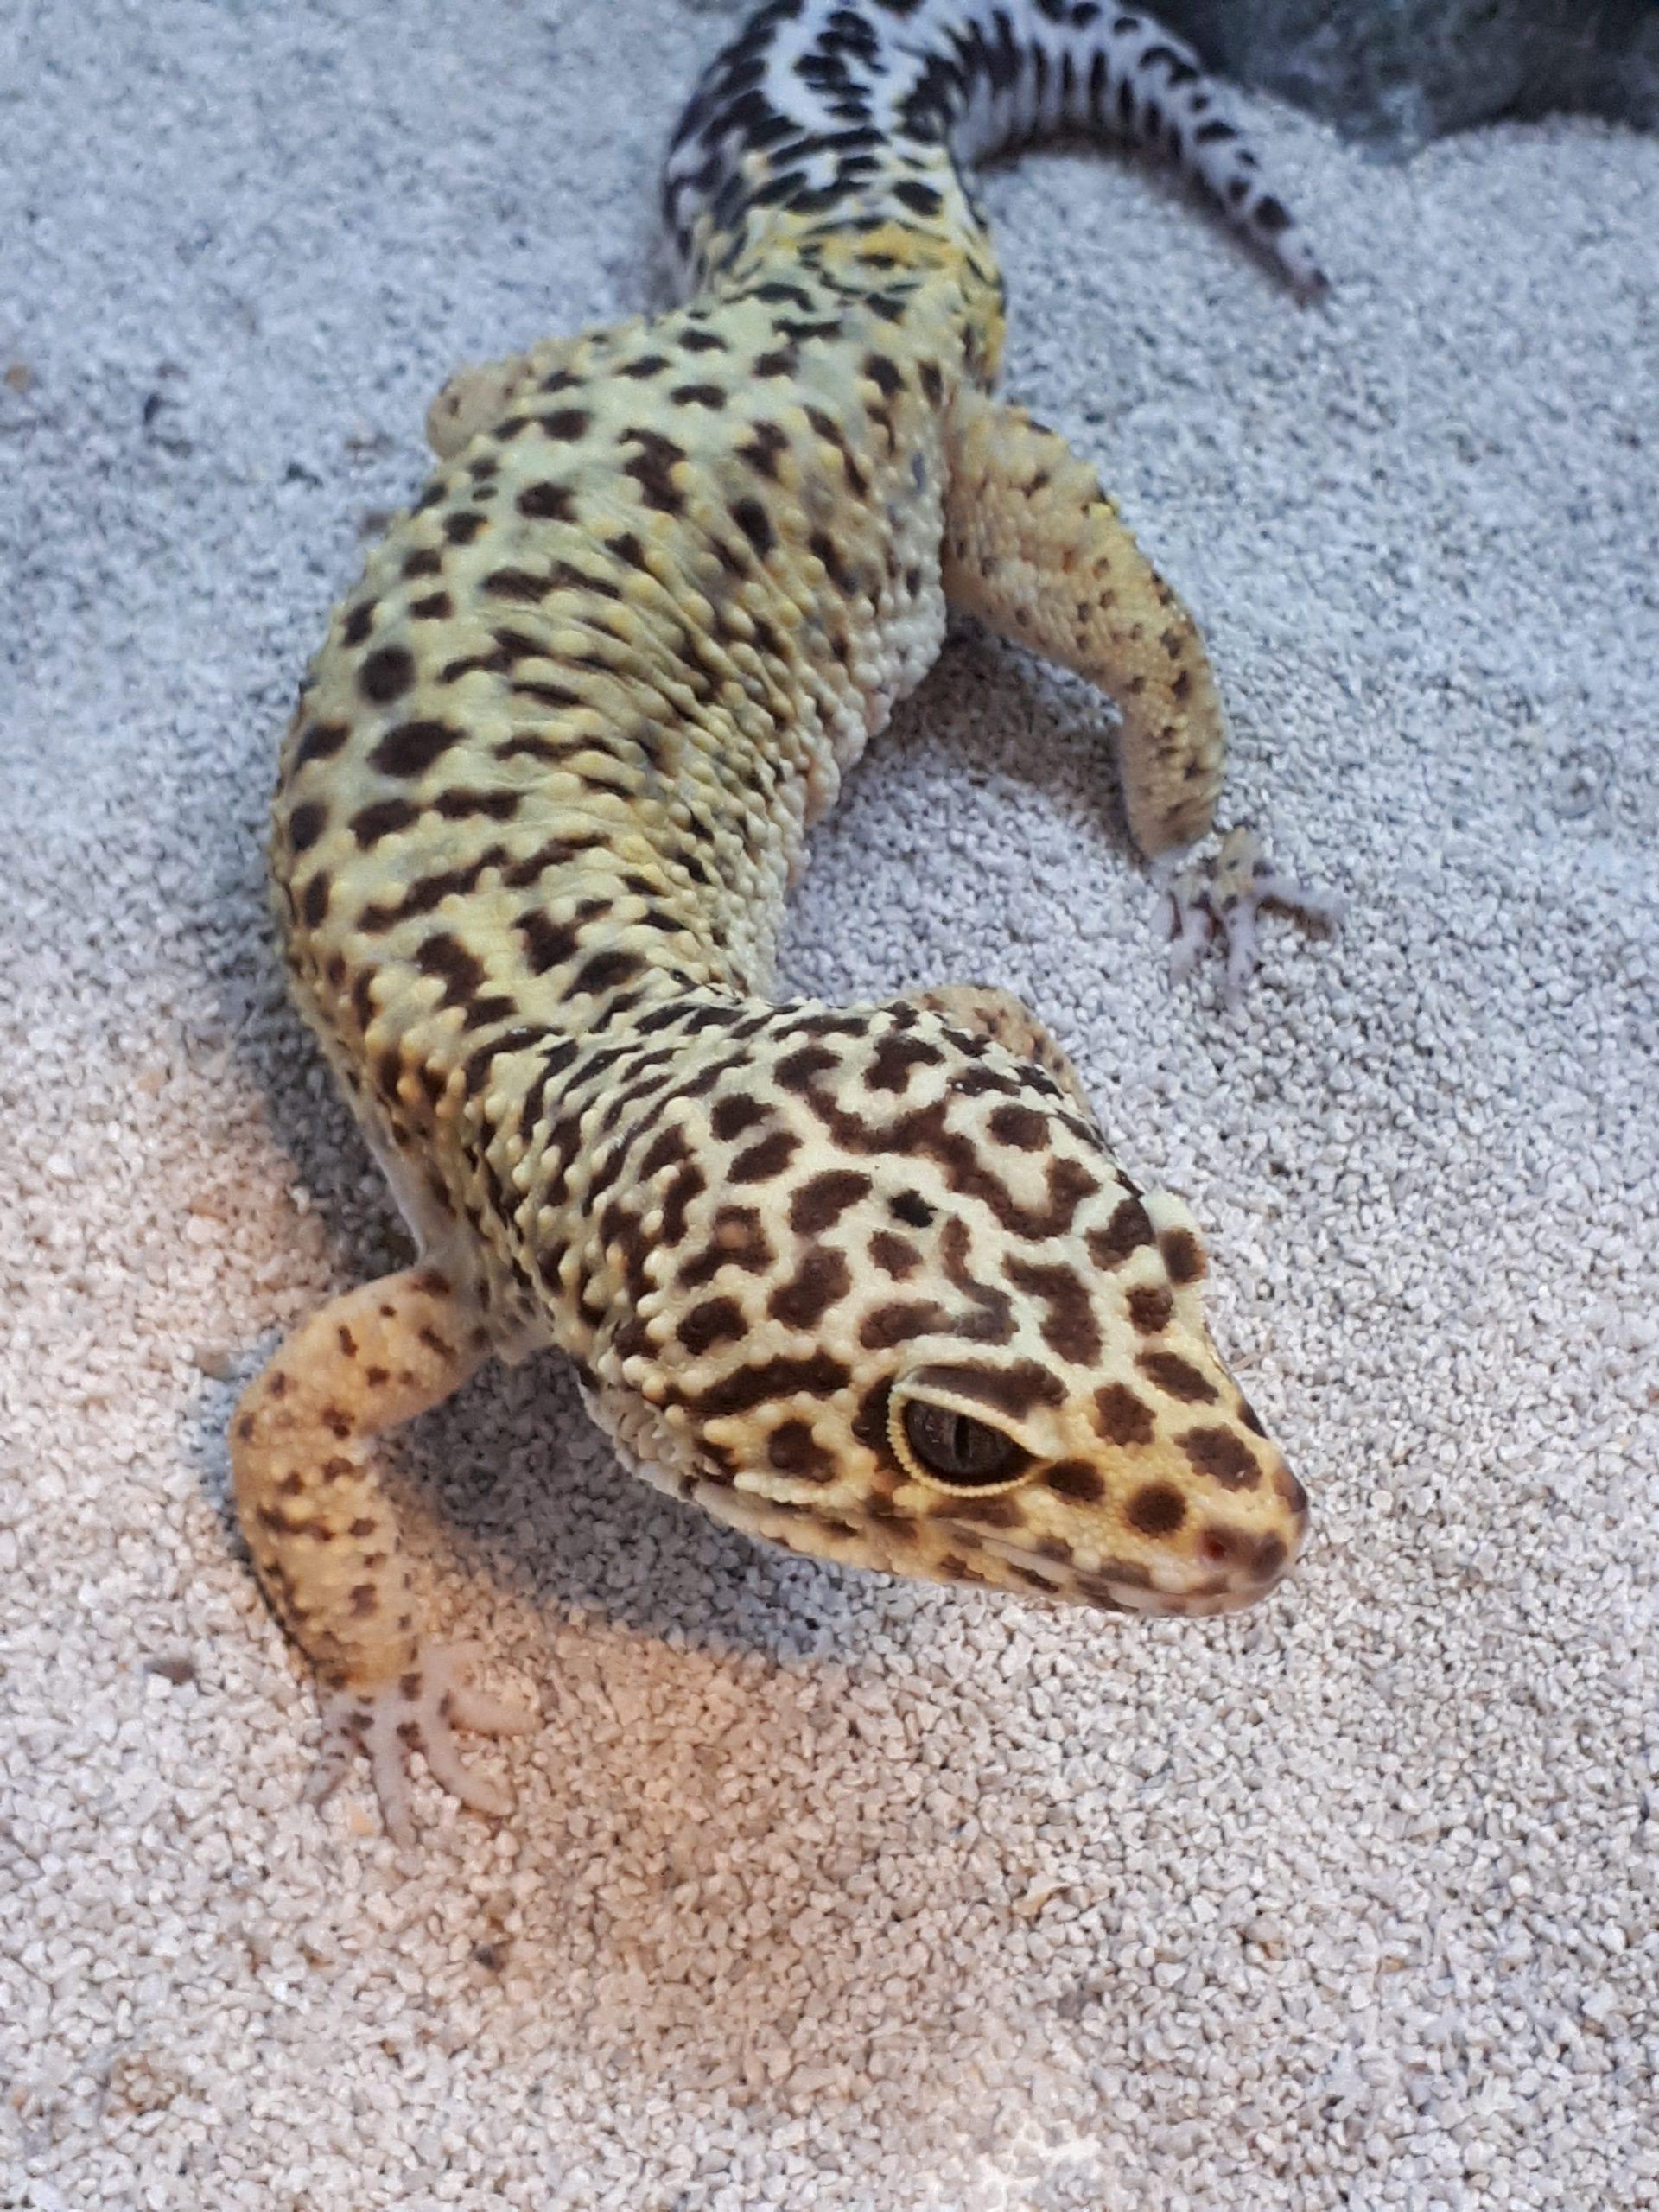 Leopard Gecko CB (Eublepharis macularius) Image